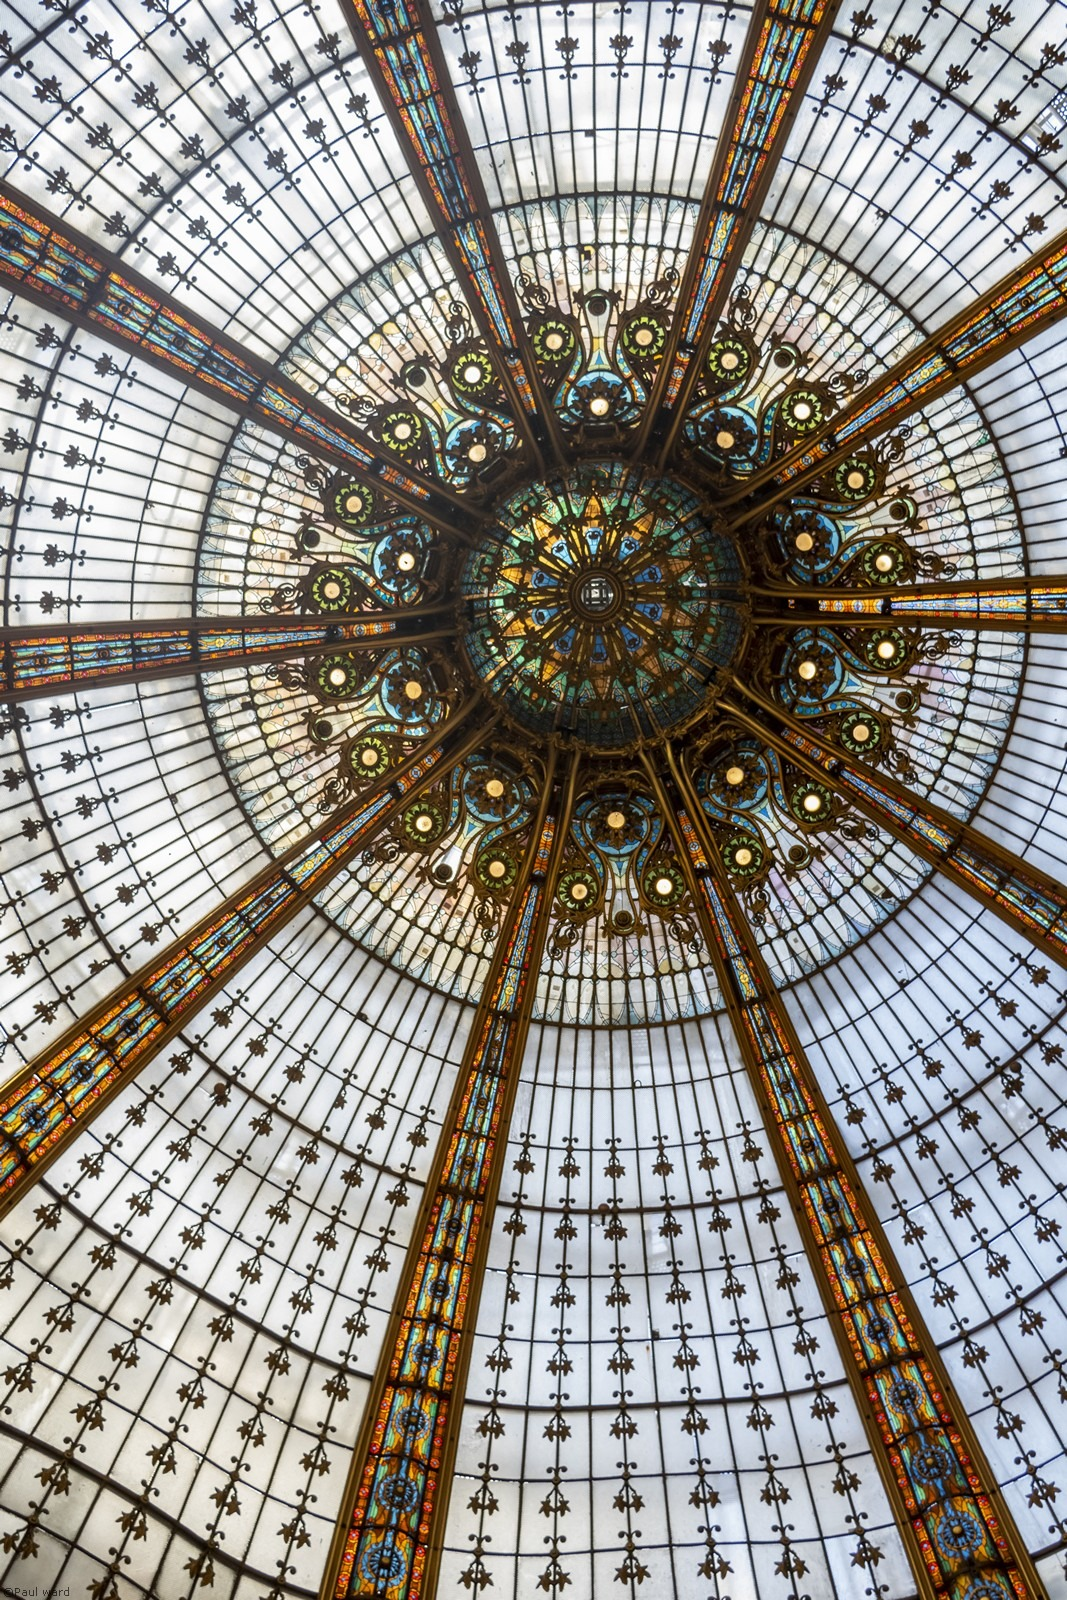 Galeries Lafayette Paris by architectural photographer Paul Ward